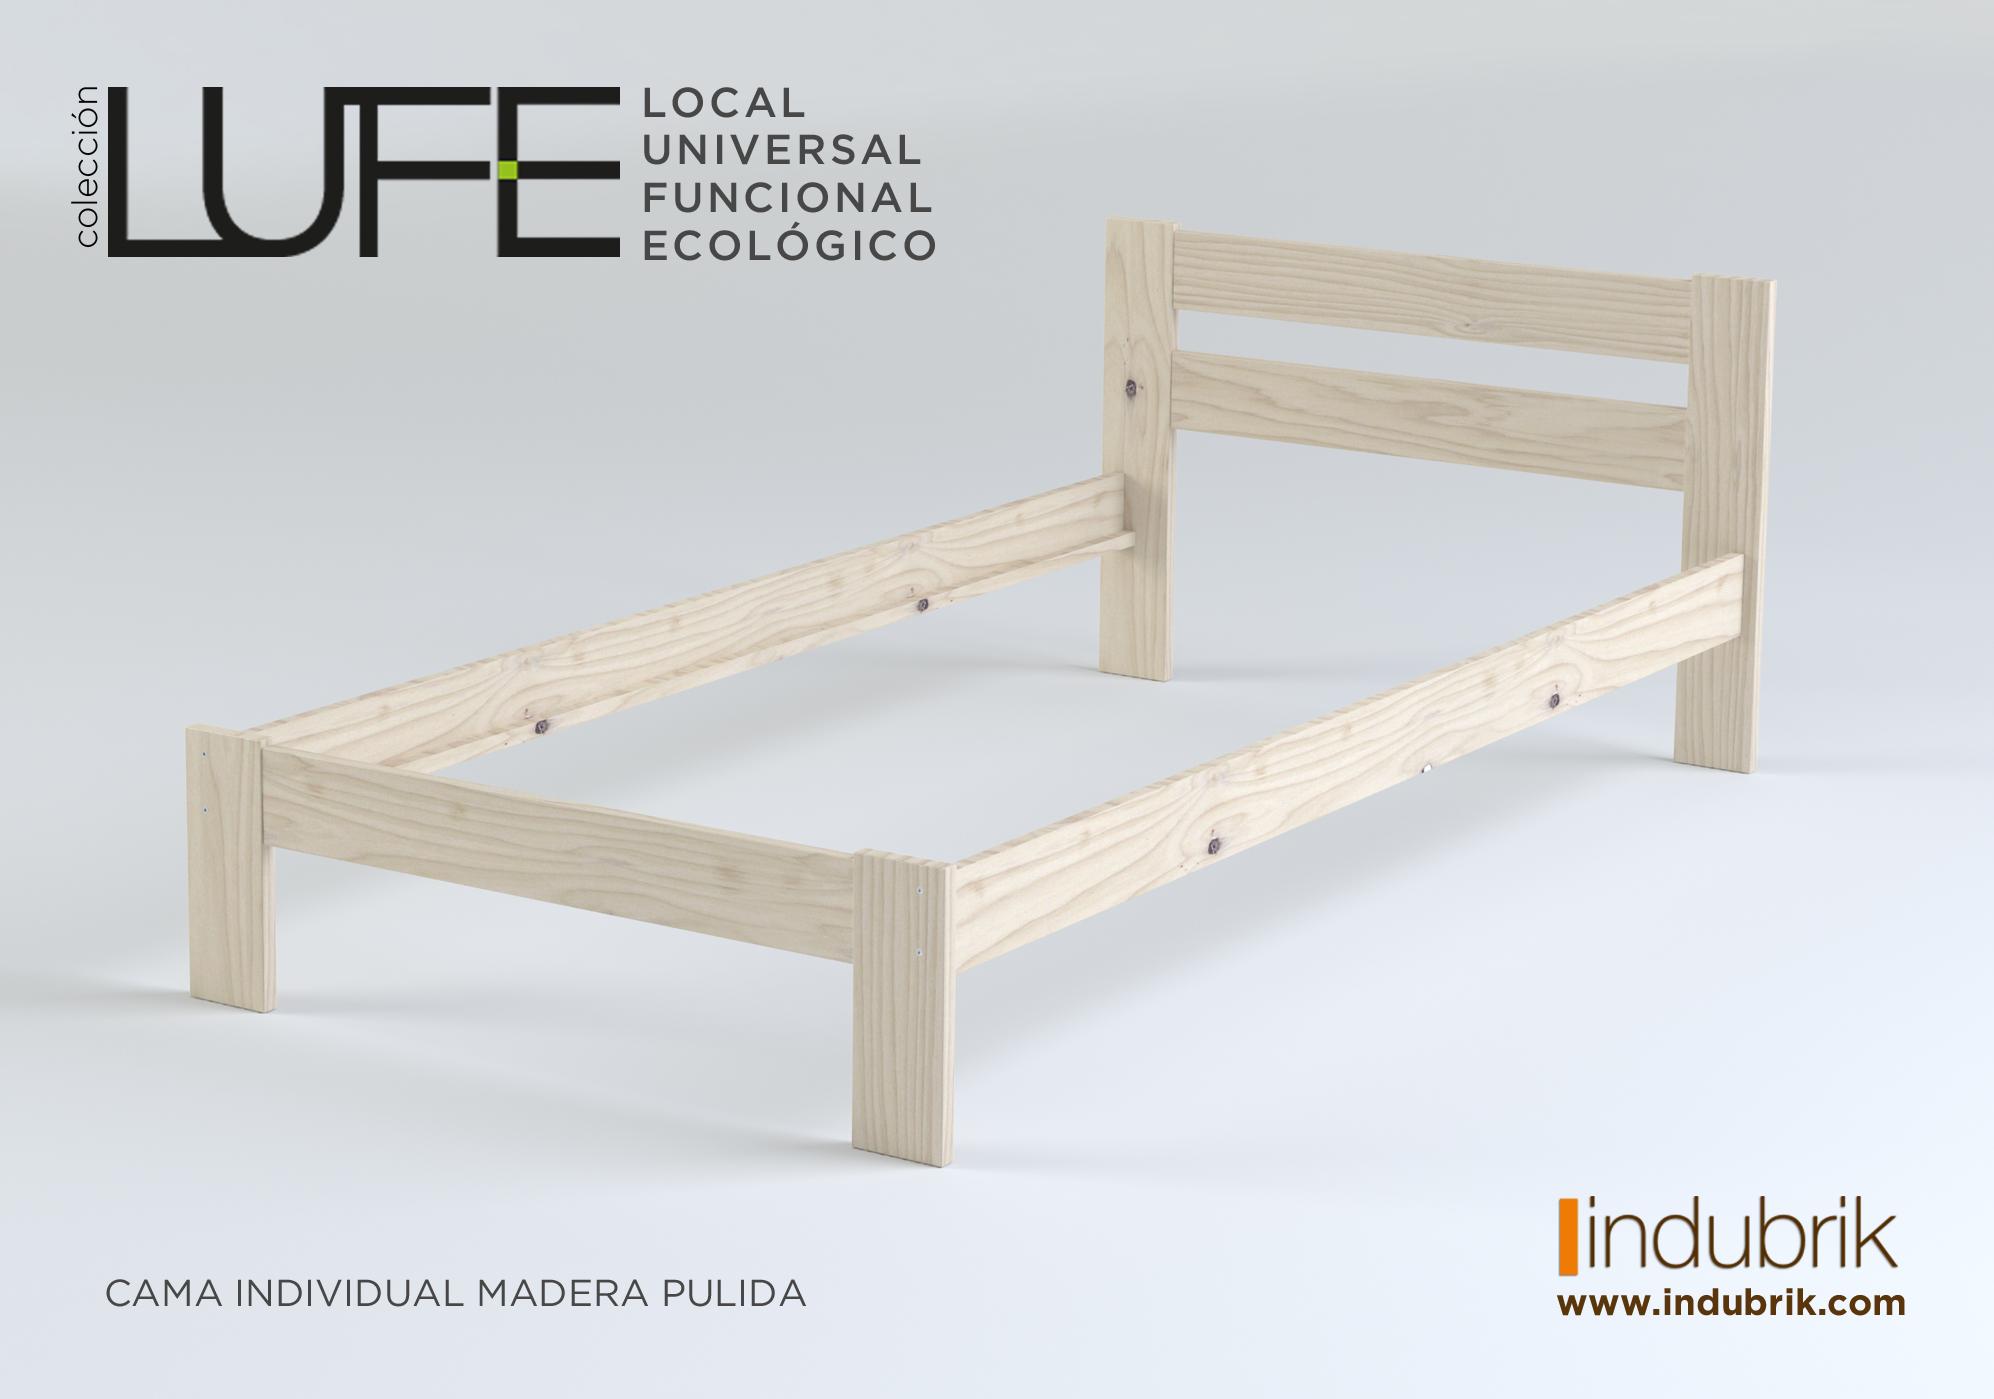 Lufe muebles nacionales anticrisis blog muebles lufe for Planos de muebles de madera pdf